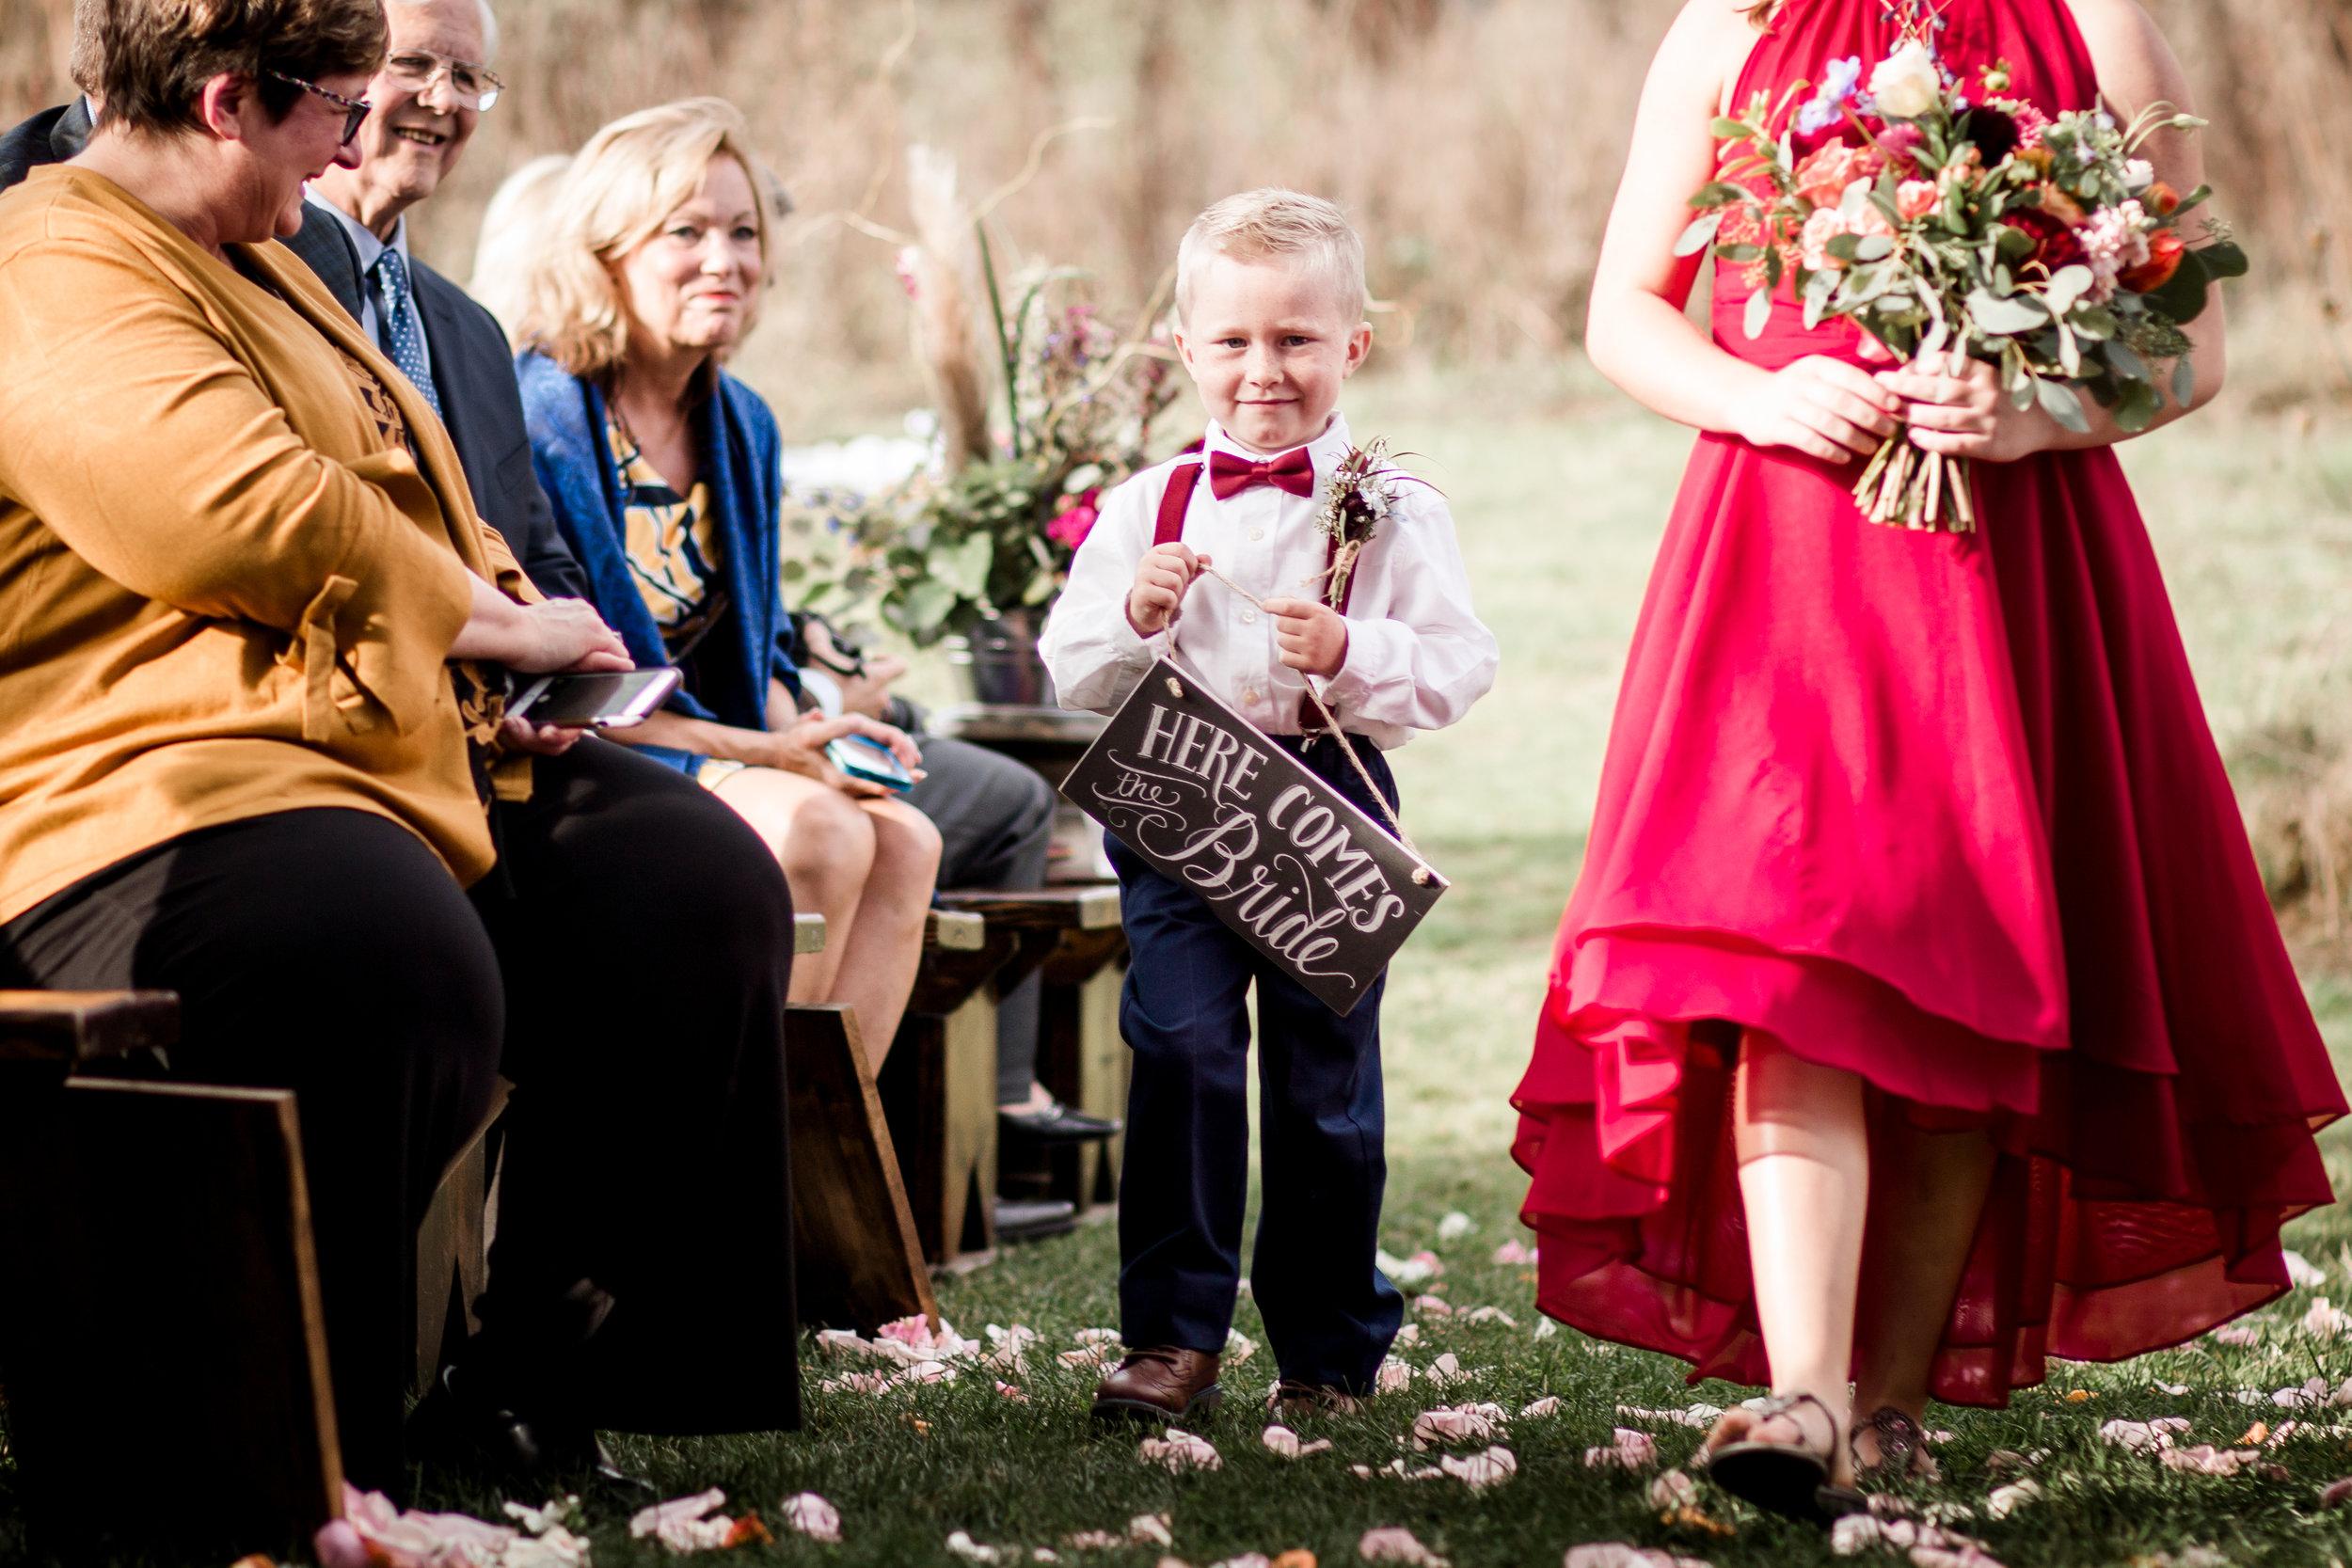 Bridalbliss.com | Portland Wedding | Oregon Event Planning and Design | Kara Santa Ana Photography